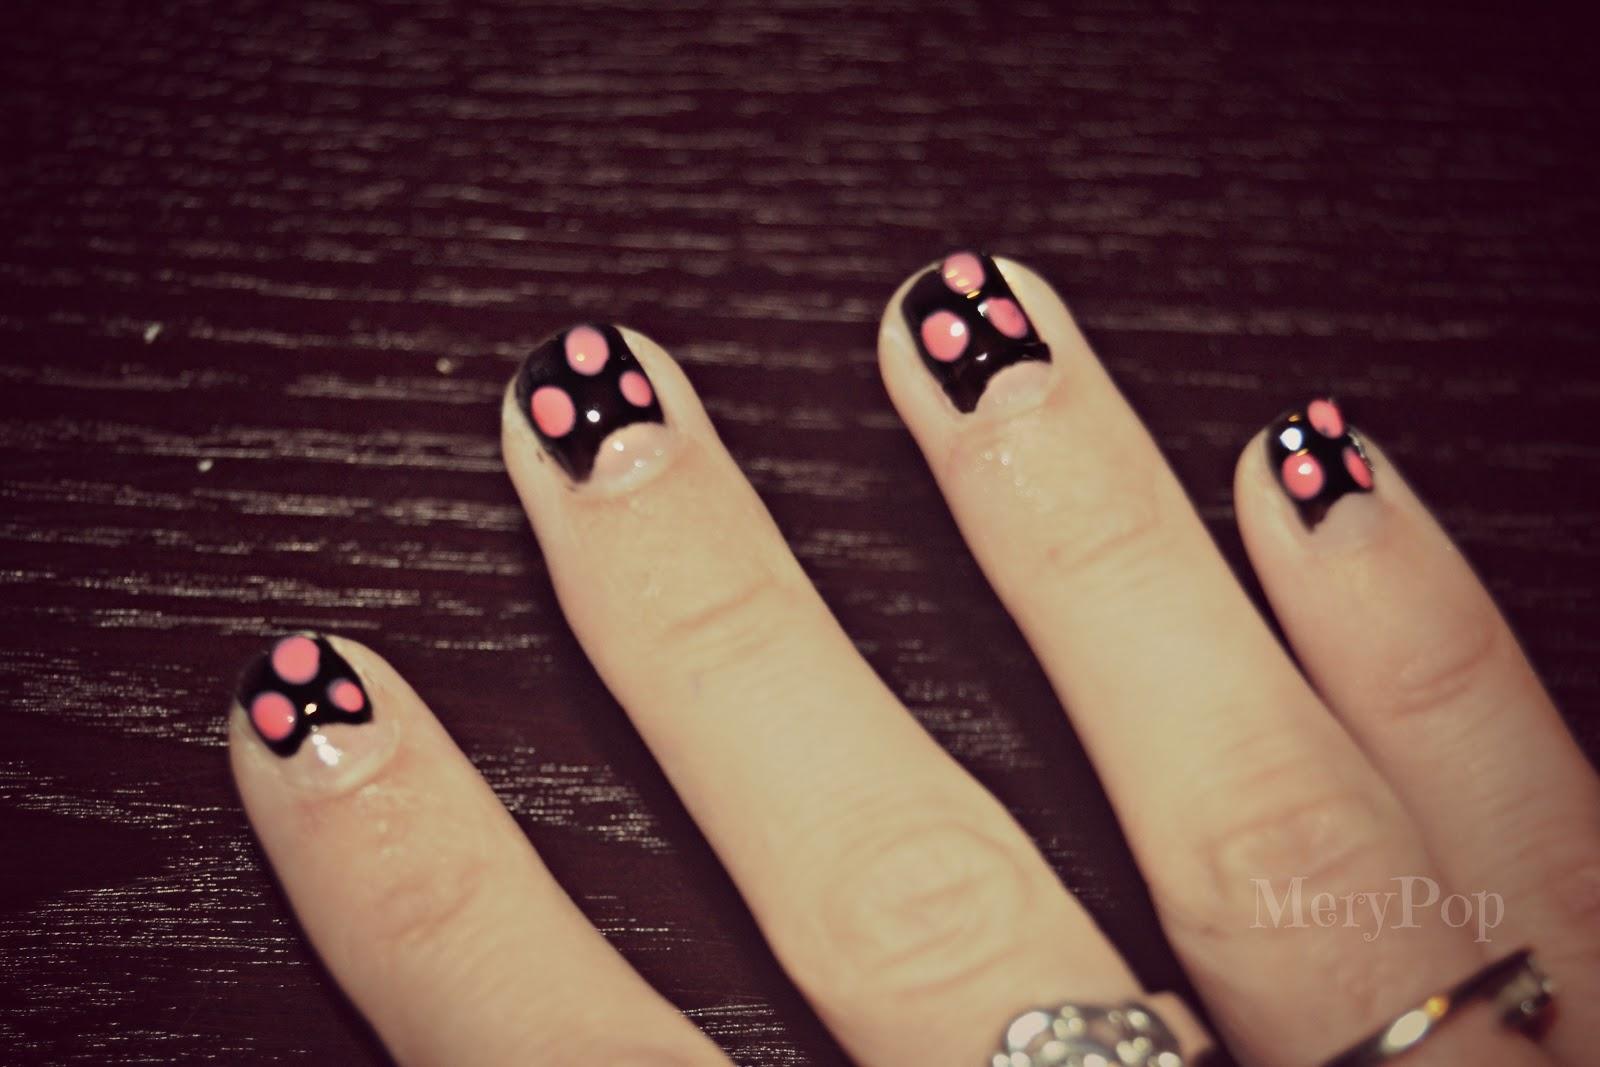 MeryPopLand: Nail Art para principiantes.